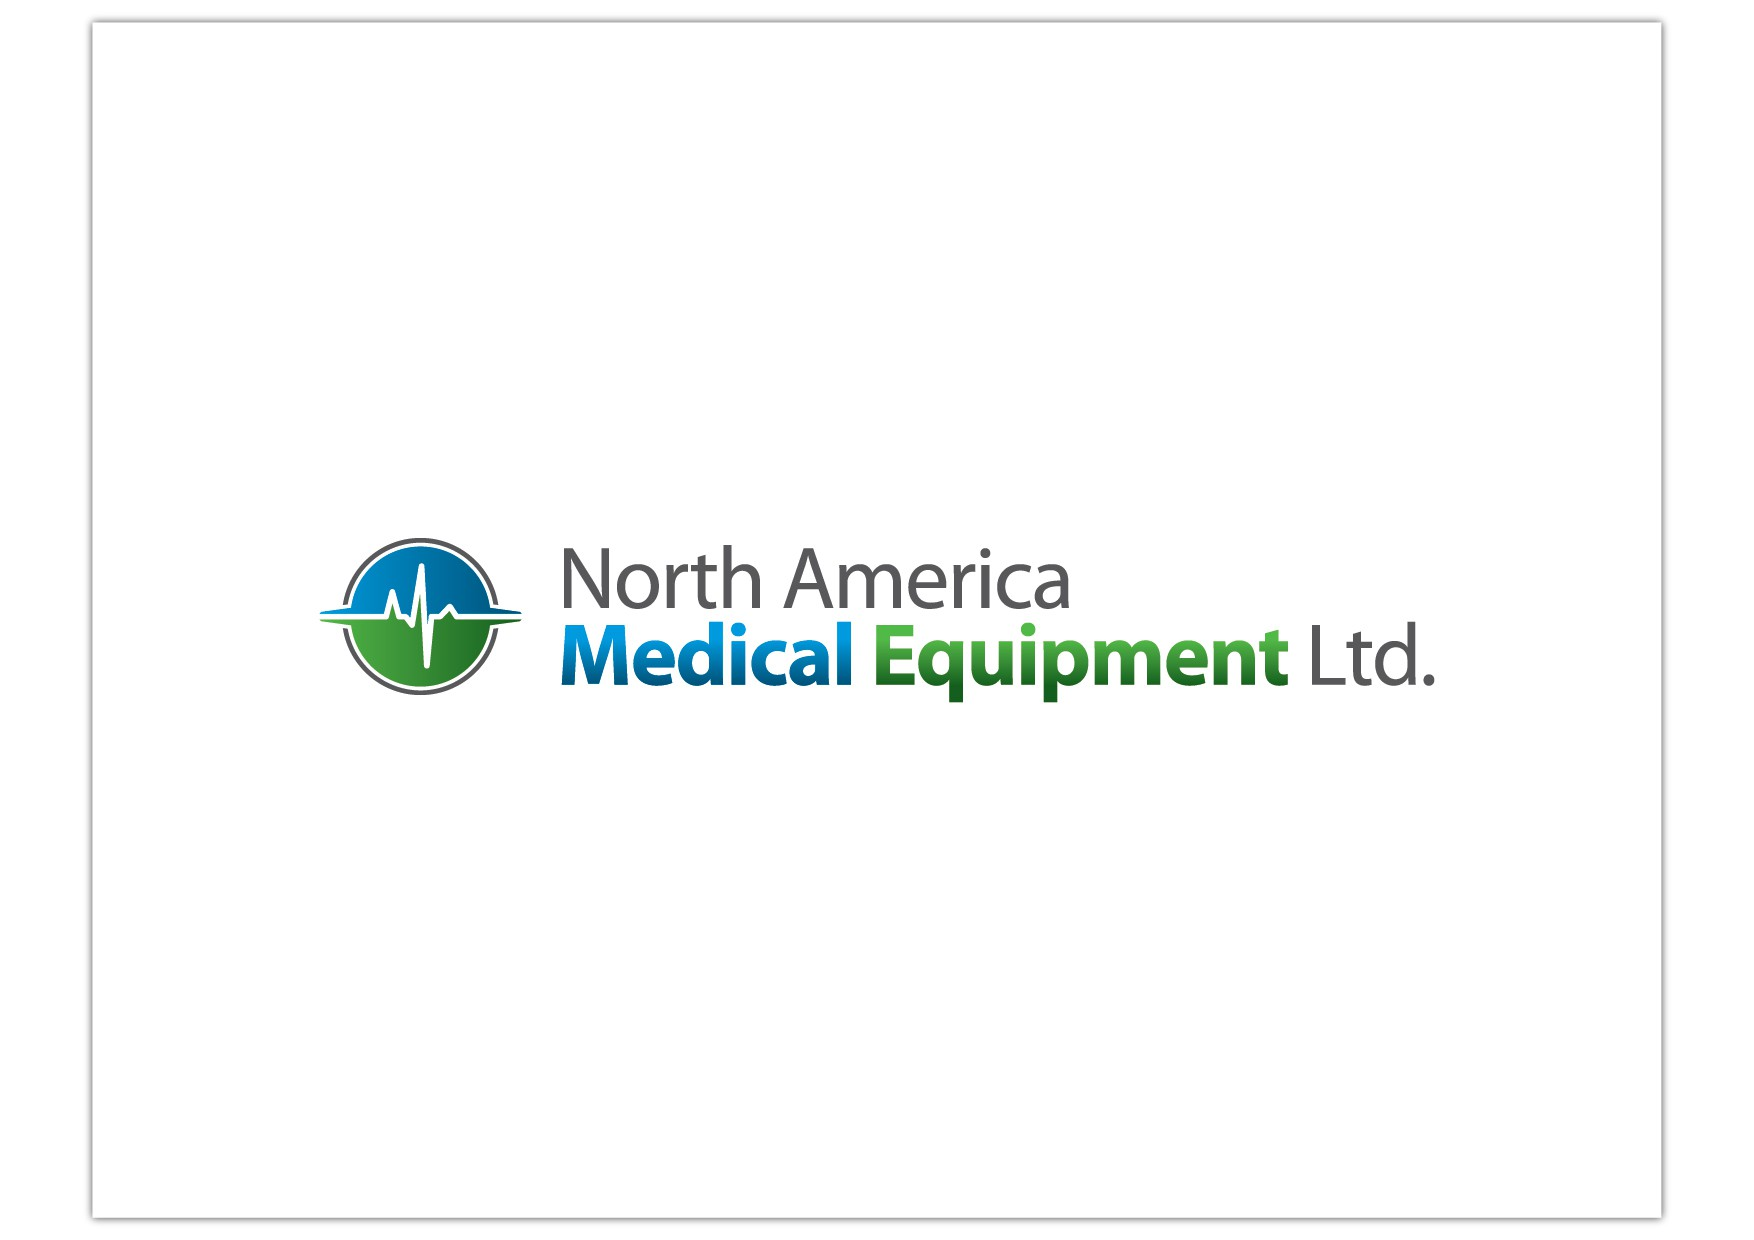 North America Medical Equipment Ltd. needs a new logo